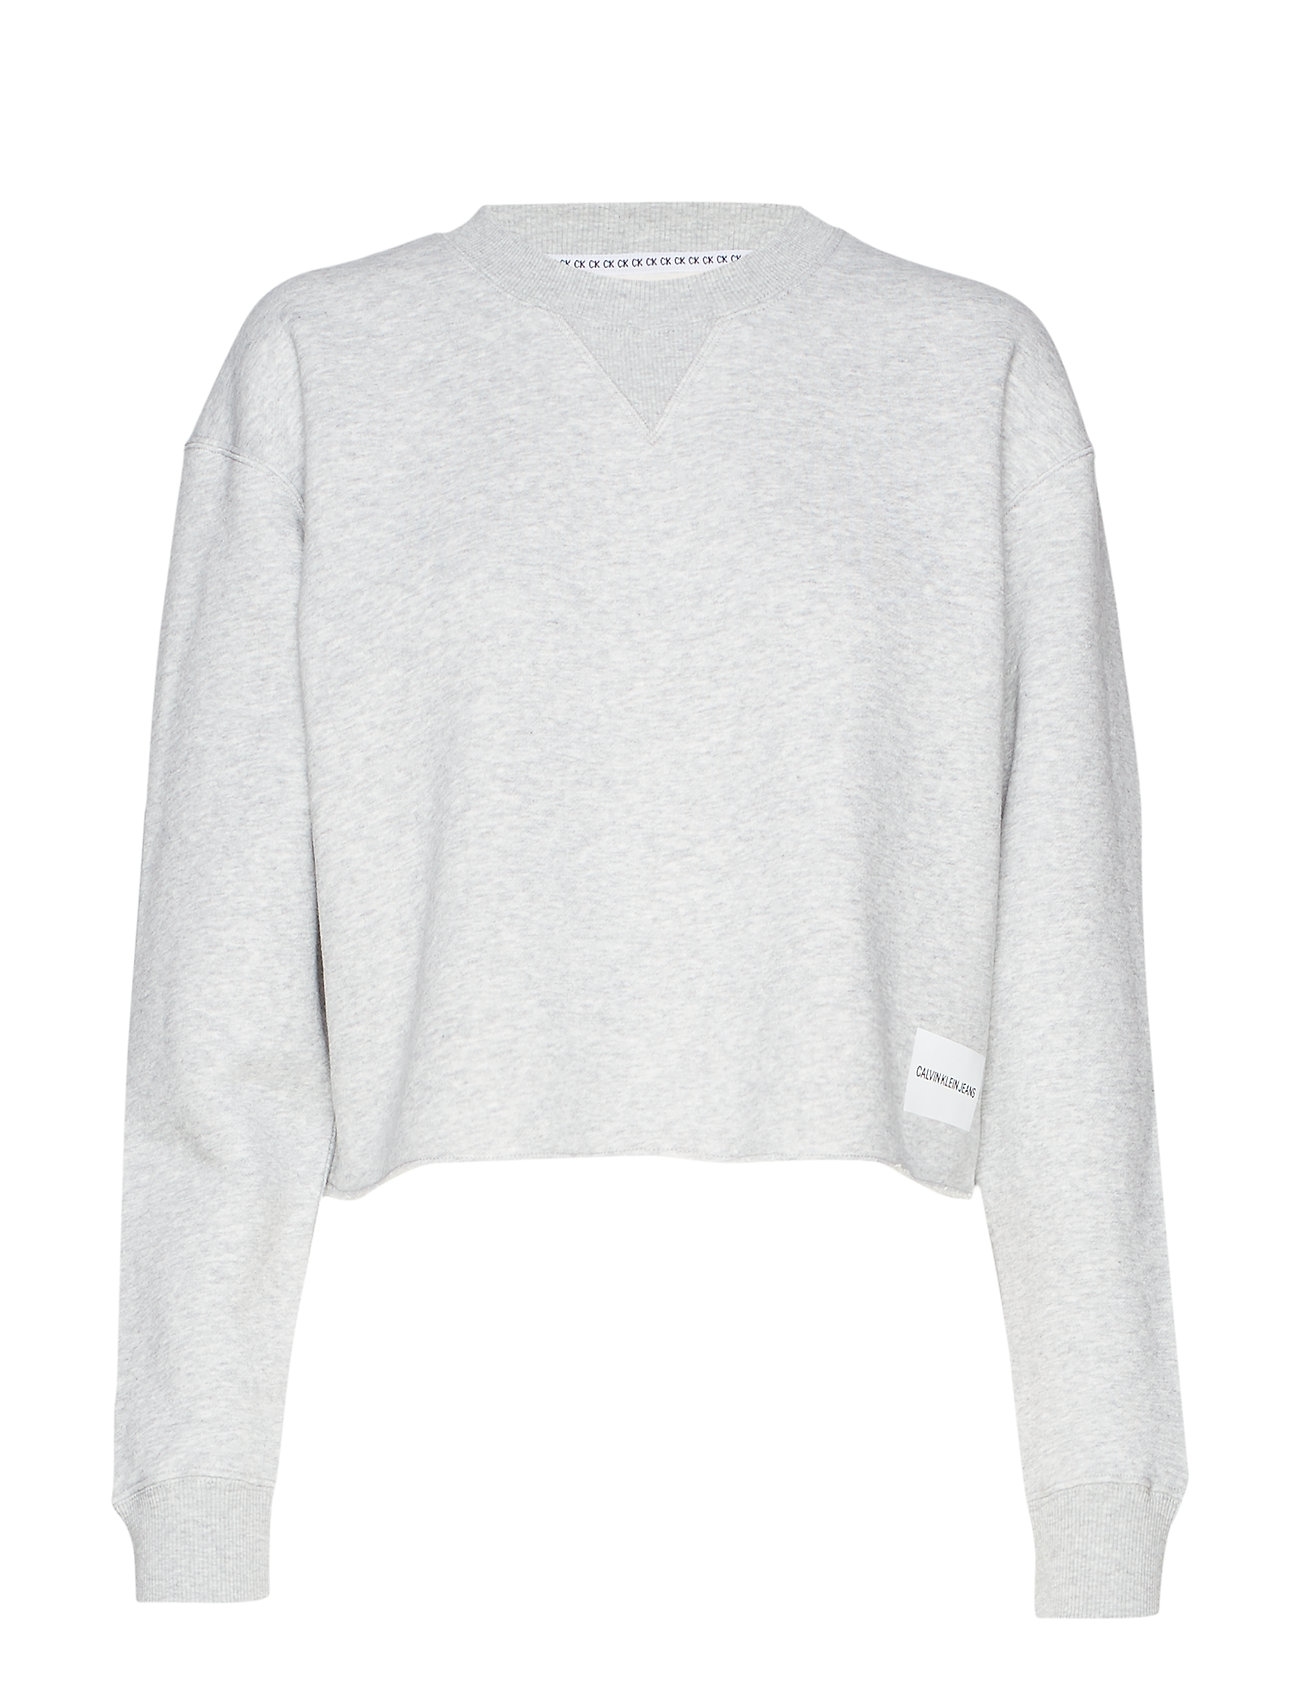 Calvin Klein Jeans RAW HEM CREW NECK - LIGHT GREY HEATHER